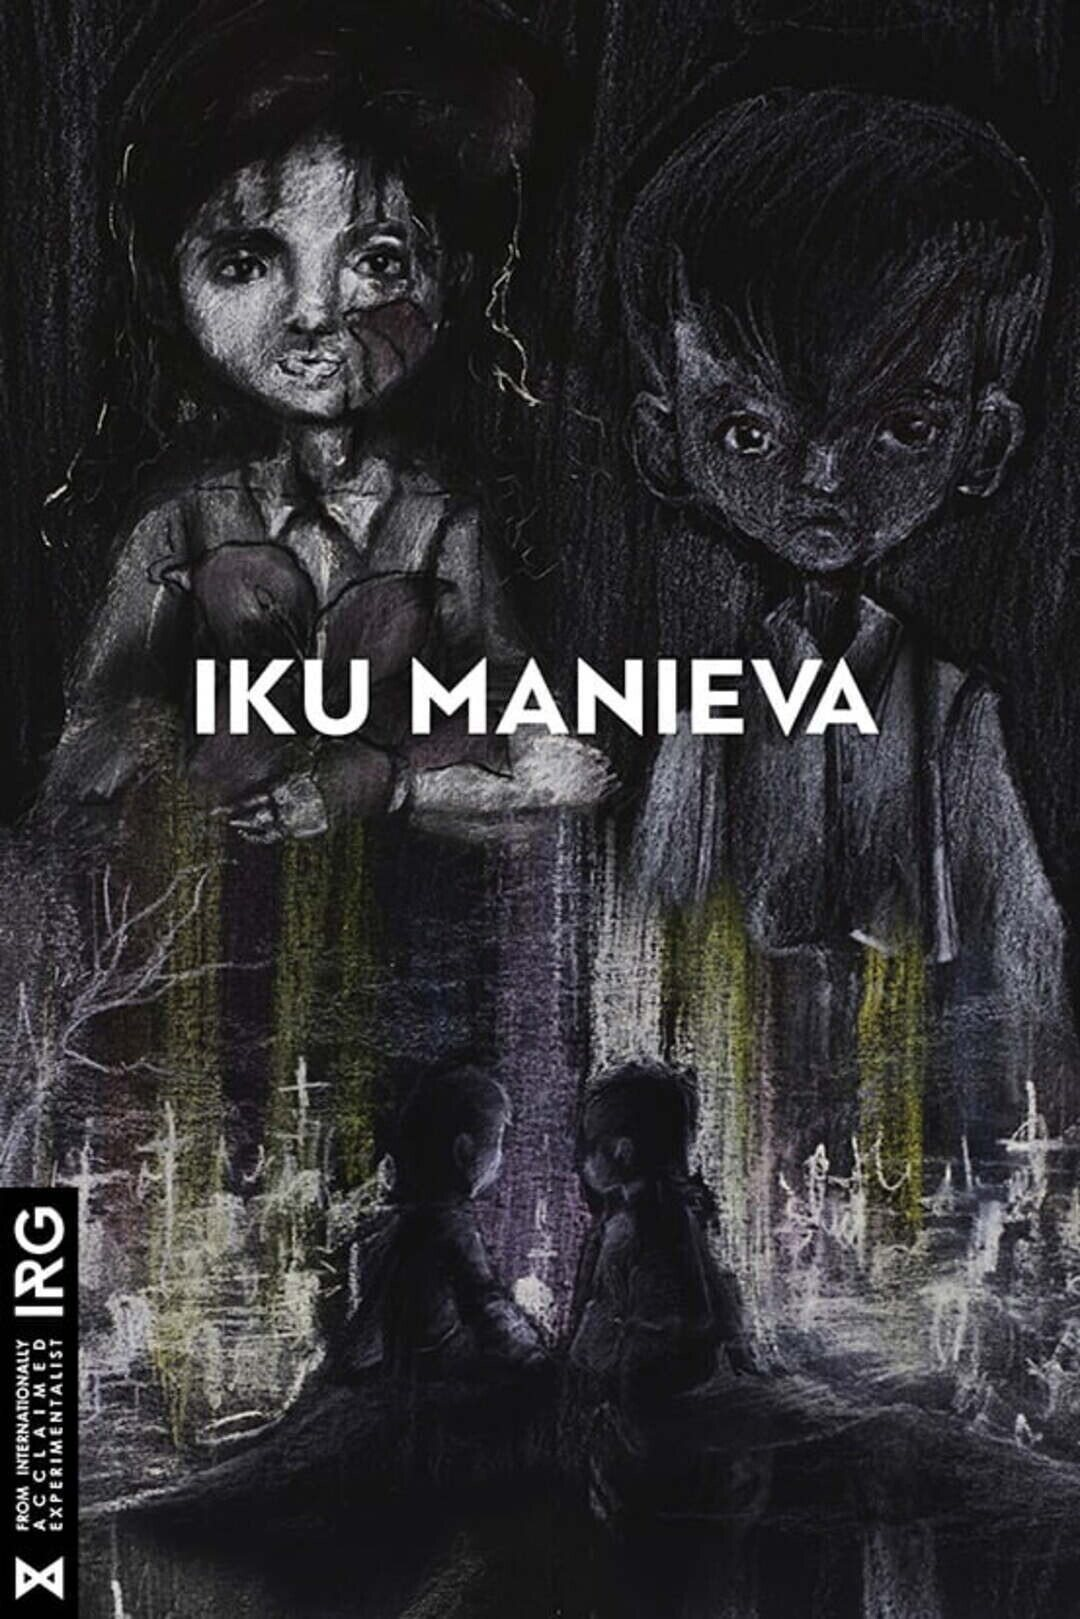 Iku Manieva Poster B Web